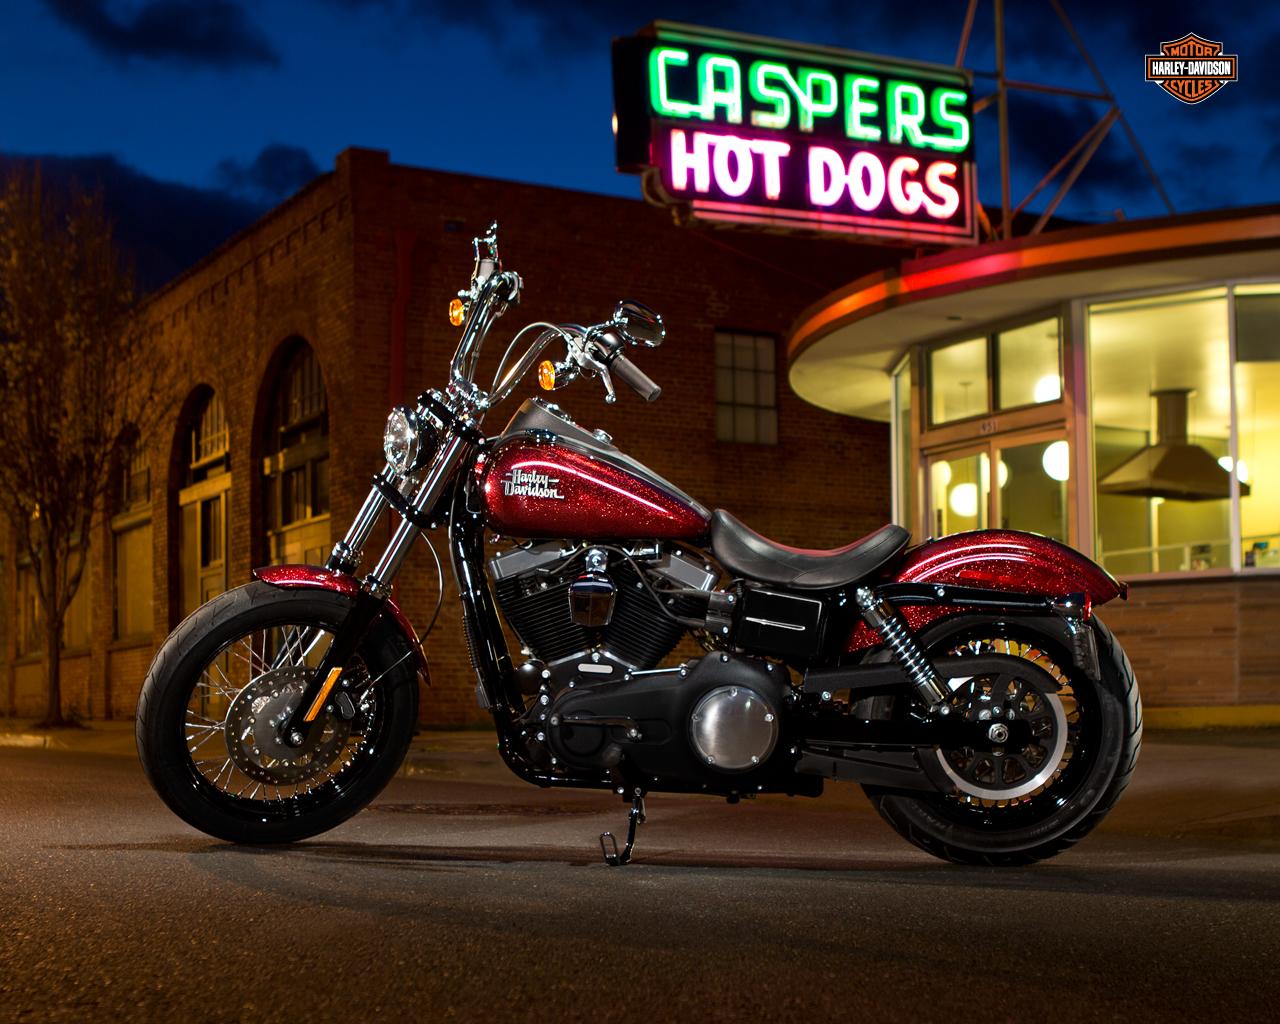 Bob 2013 Harley Davidson Street Bob Price Spec HD Wallpaper 1280x1024